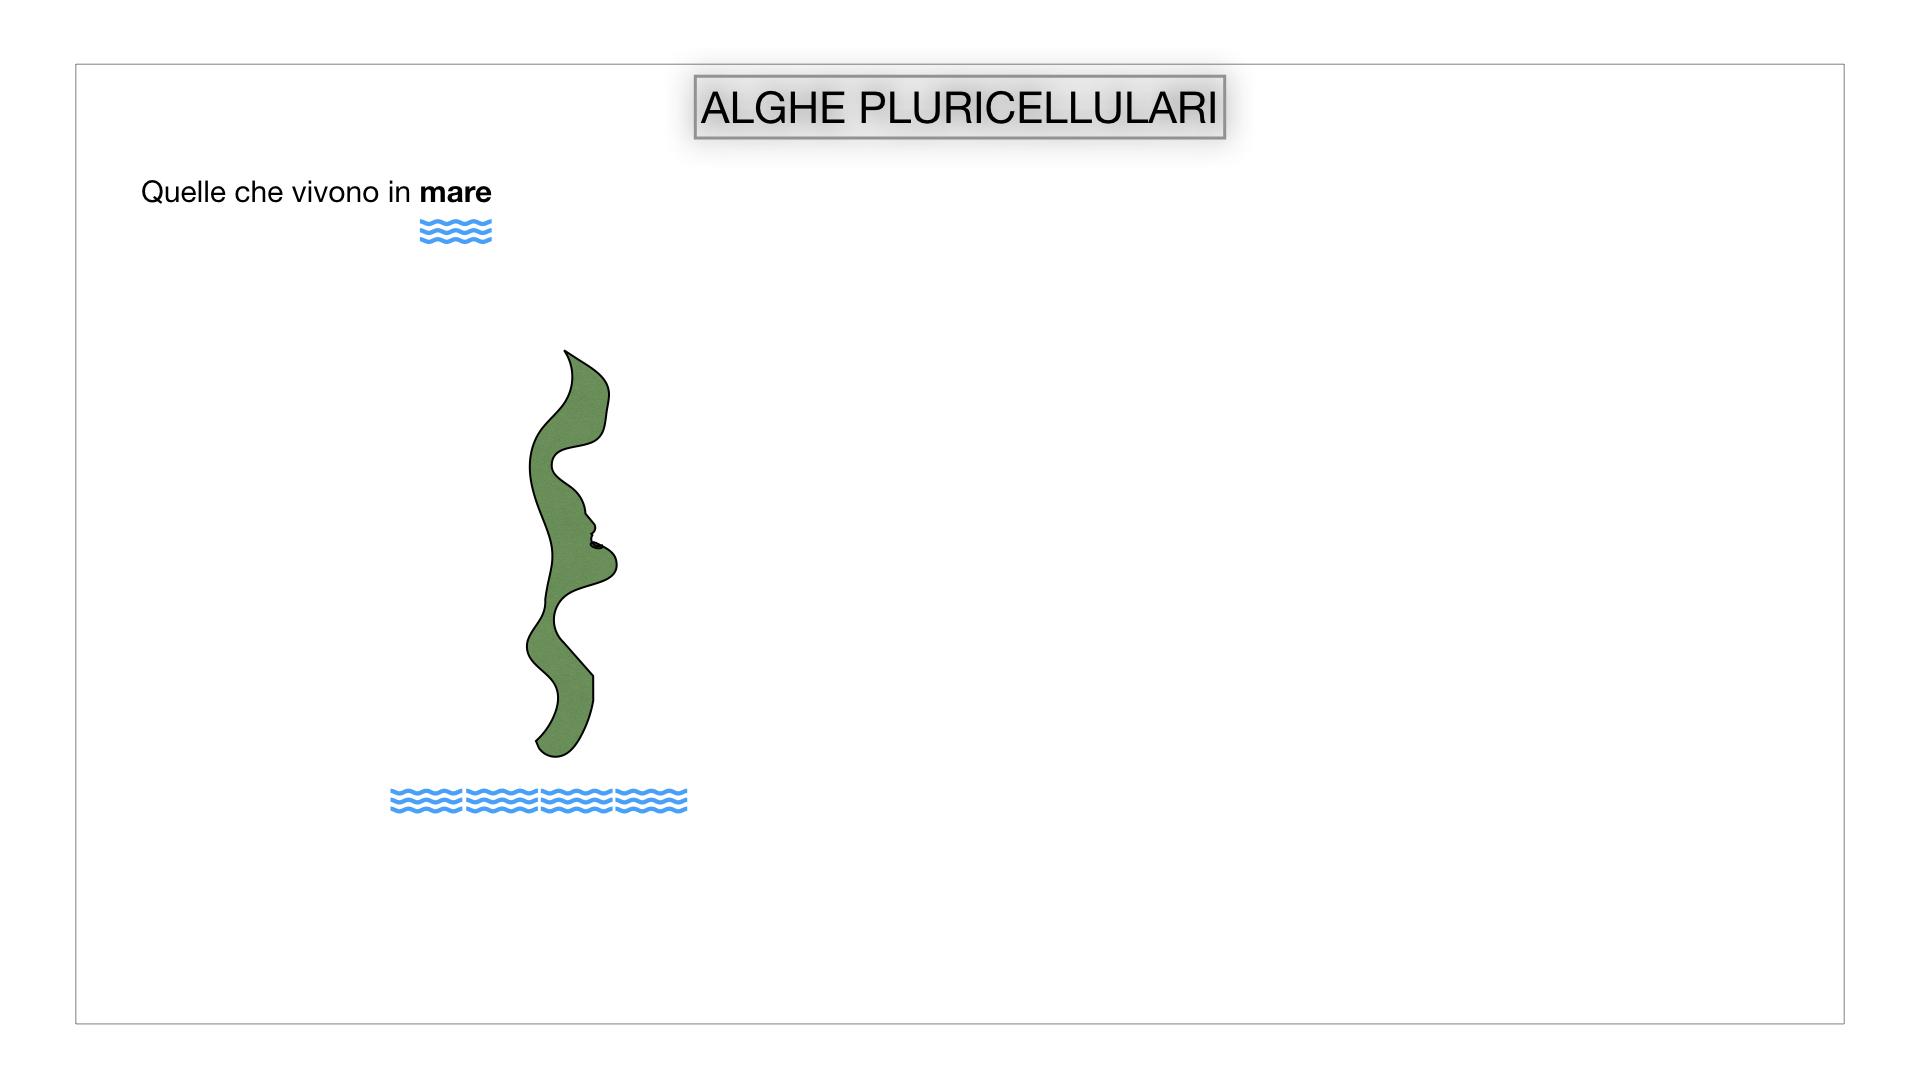 8. alghe uni_pluri_cellulari_SIMULAZIONE.032